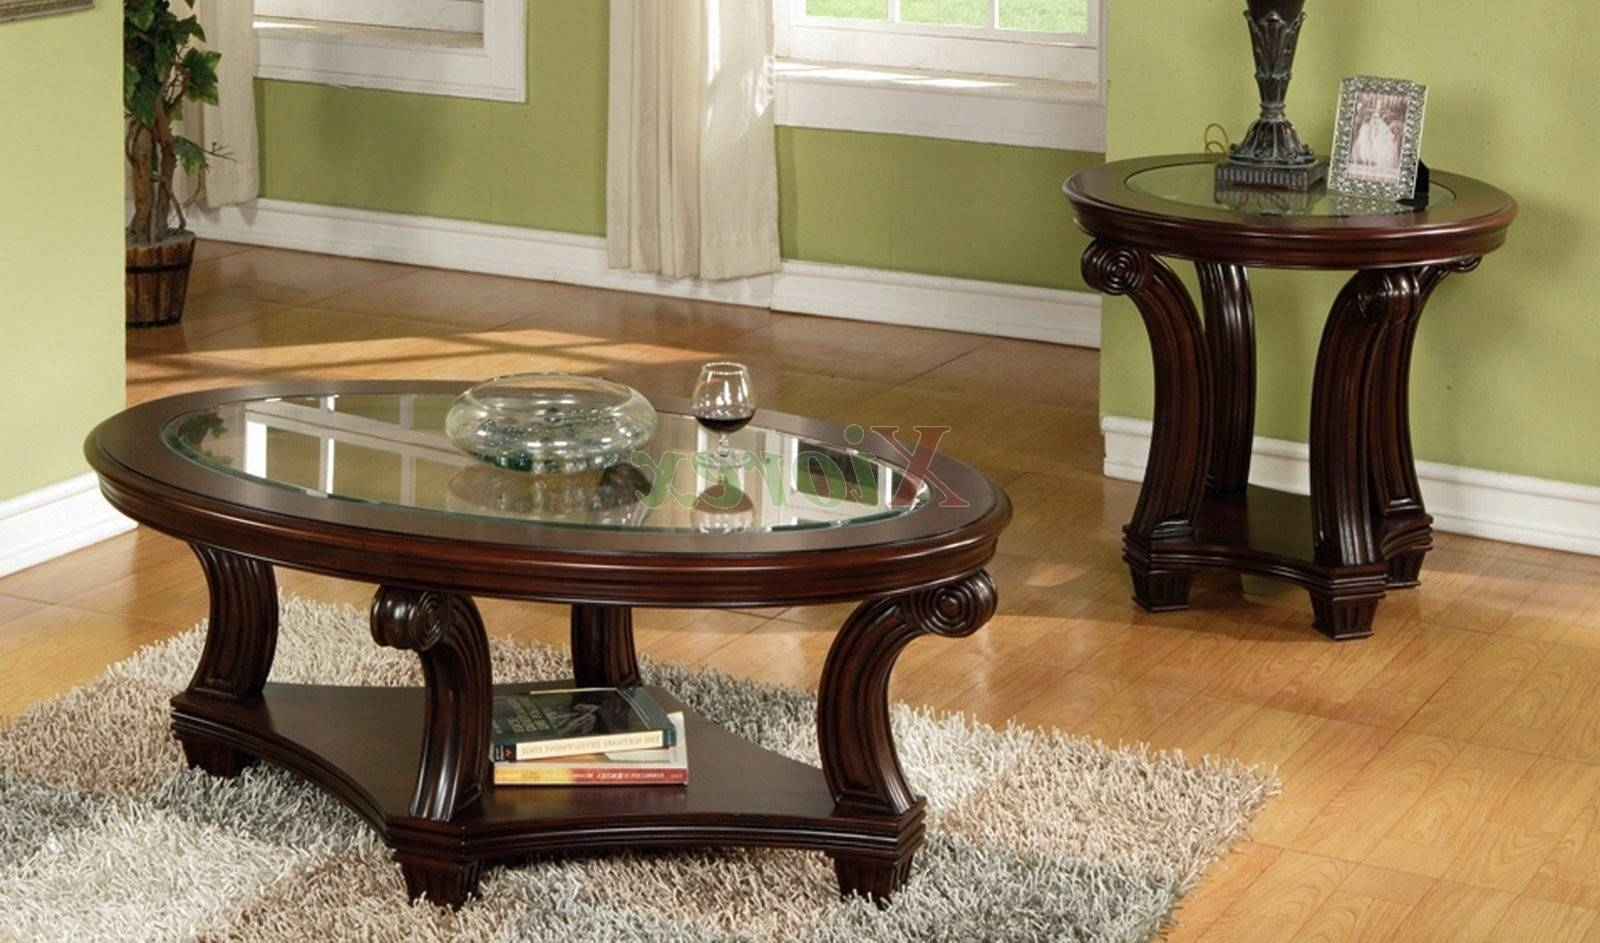 Dark Wood Round Coffee Table - Starrkingschool inside Dark Wood Round Coffee Tables (Image 16 of 30)